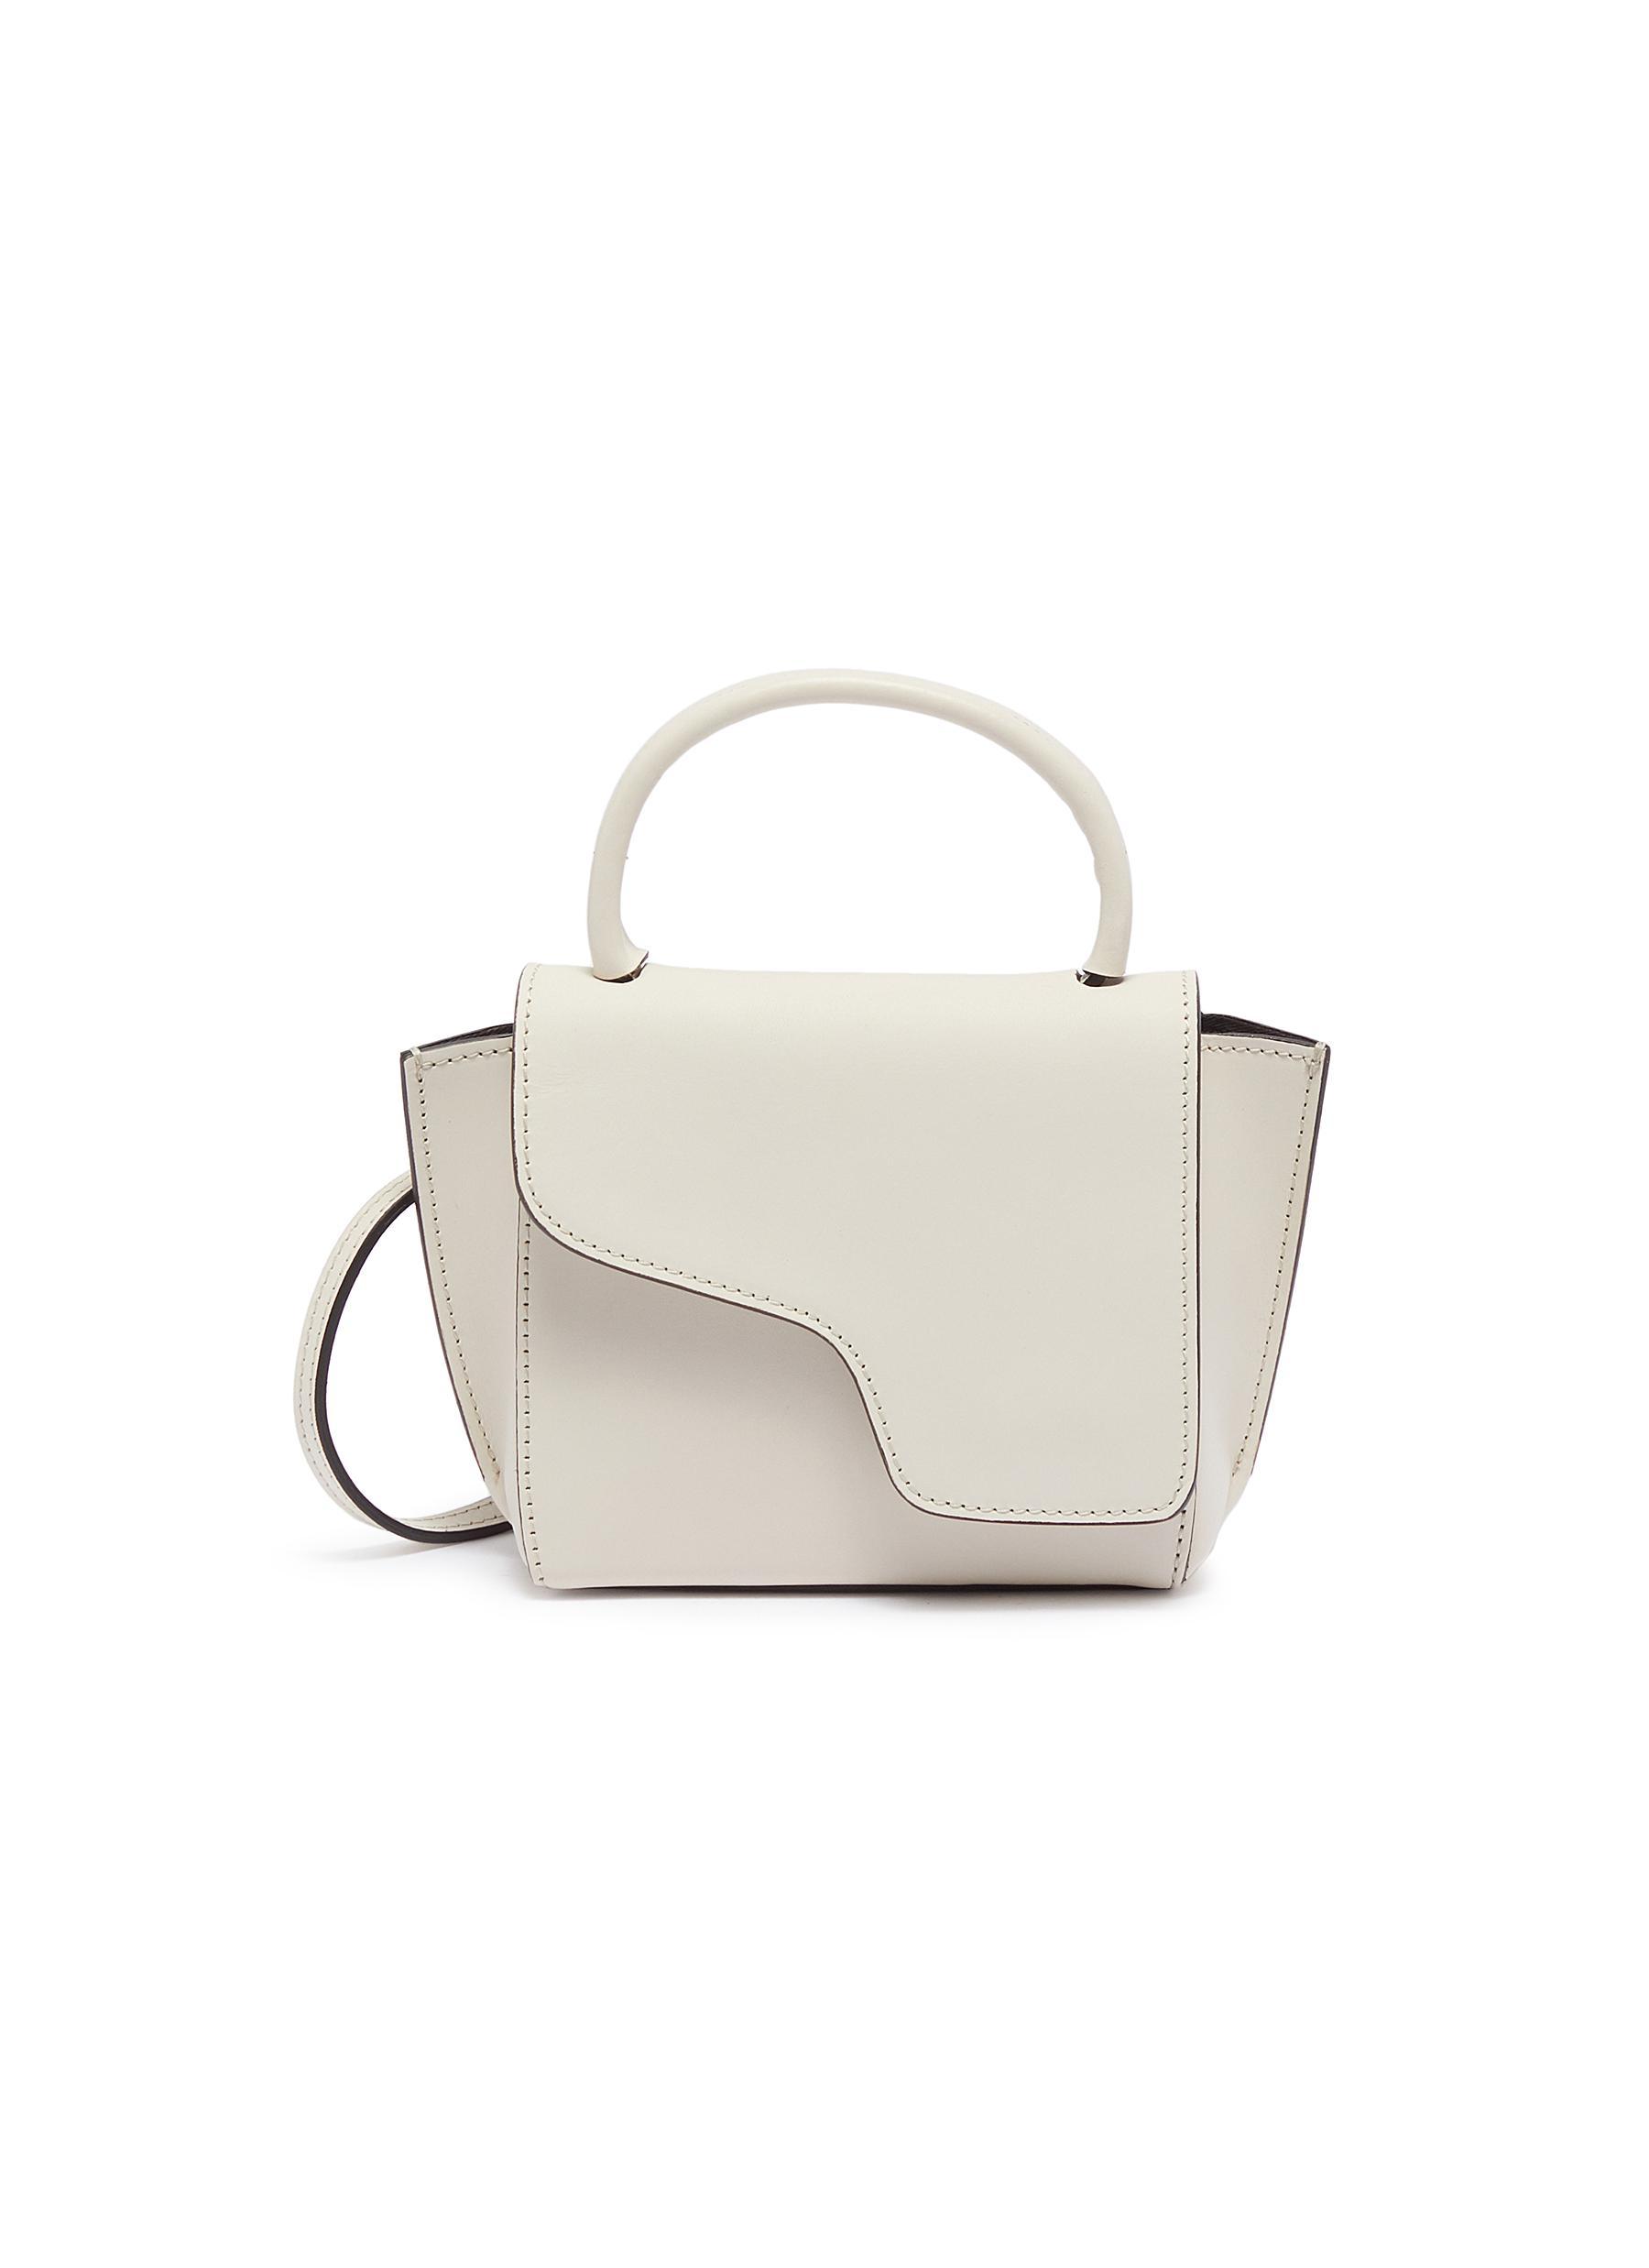 Atp Atelier 'Montalcino' Mini Top Handle Leather Bag In White